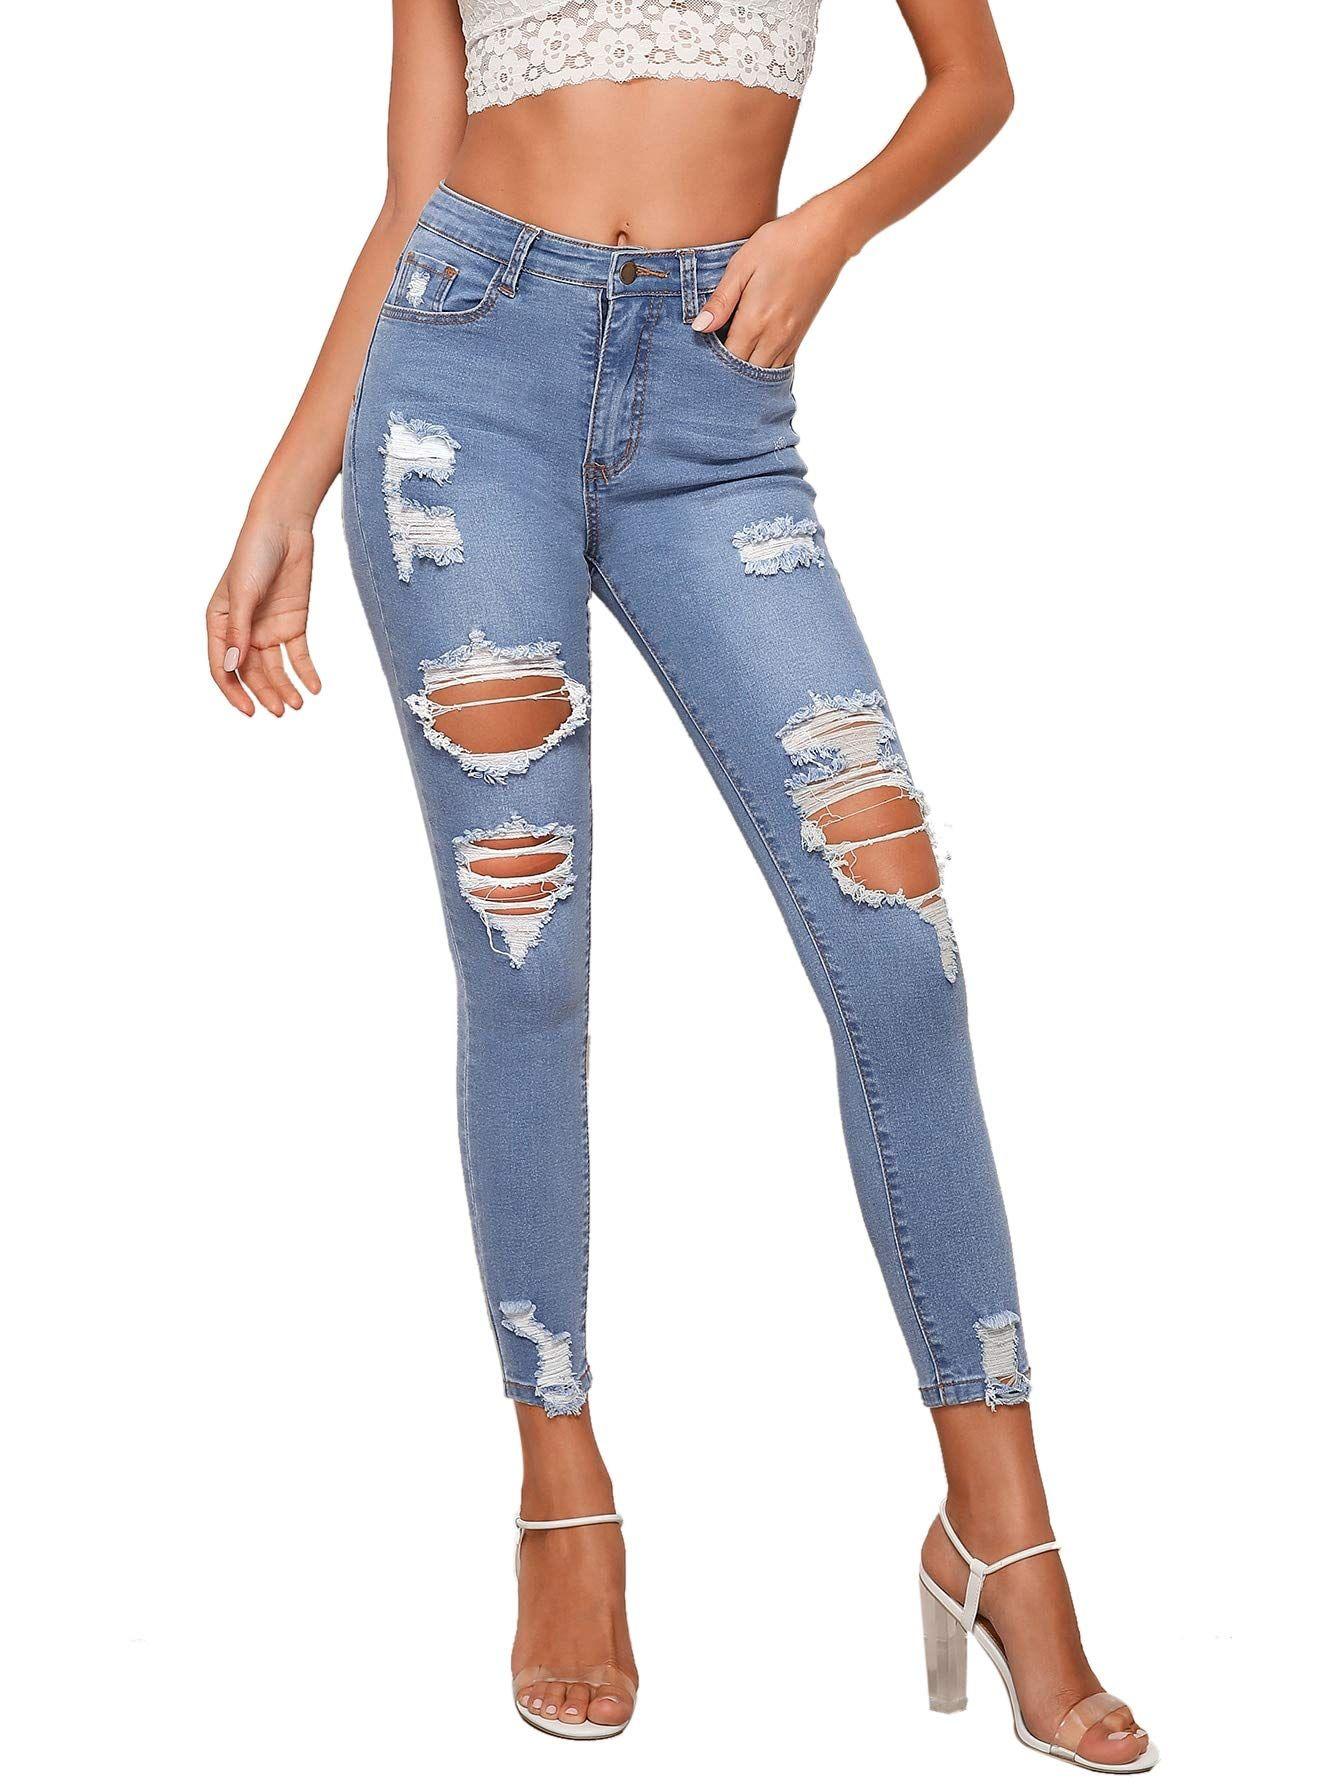 Milumia Womens Casual Mid Waist Skinny Ripped Jeans Denim Pants